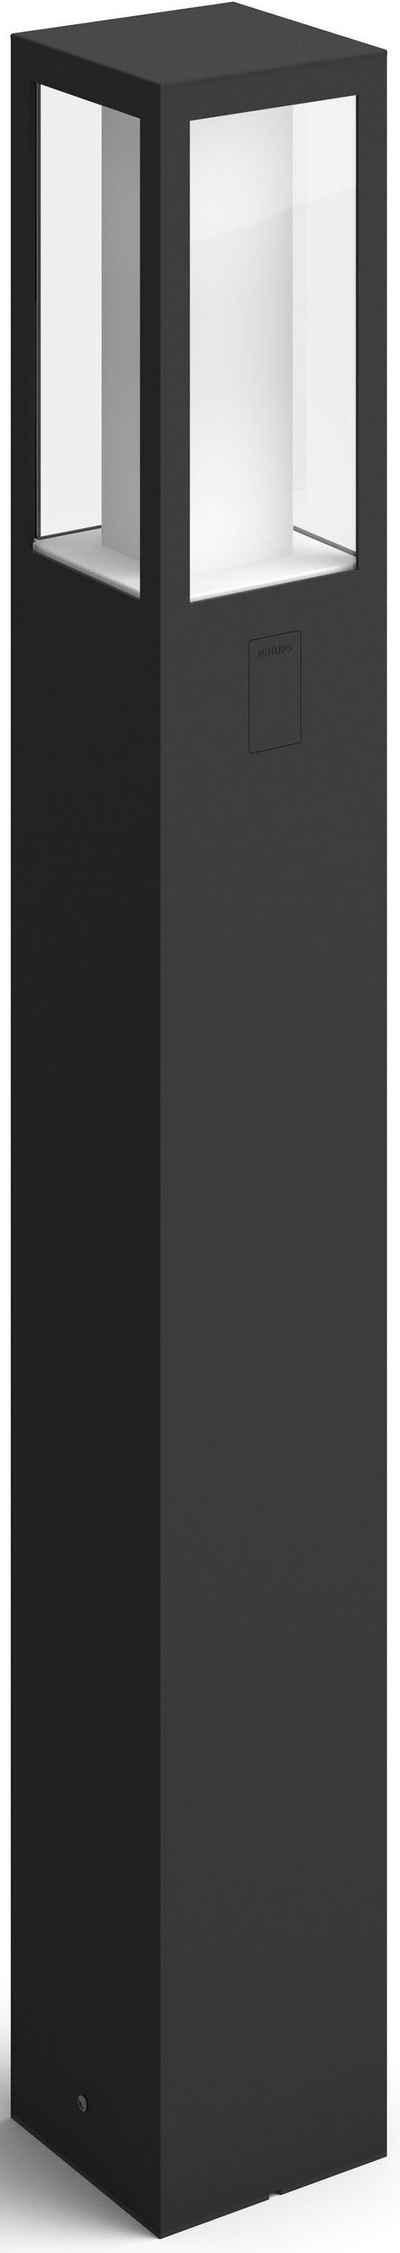 Philips Hue LED Außen-Stehlampe »Impress«